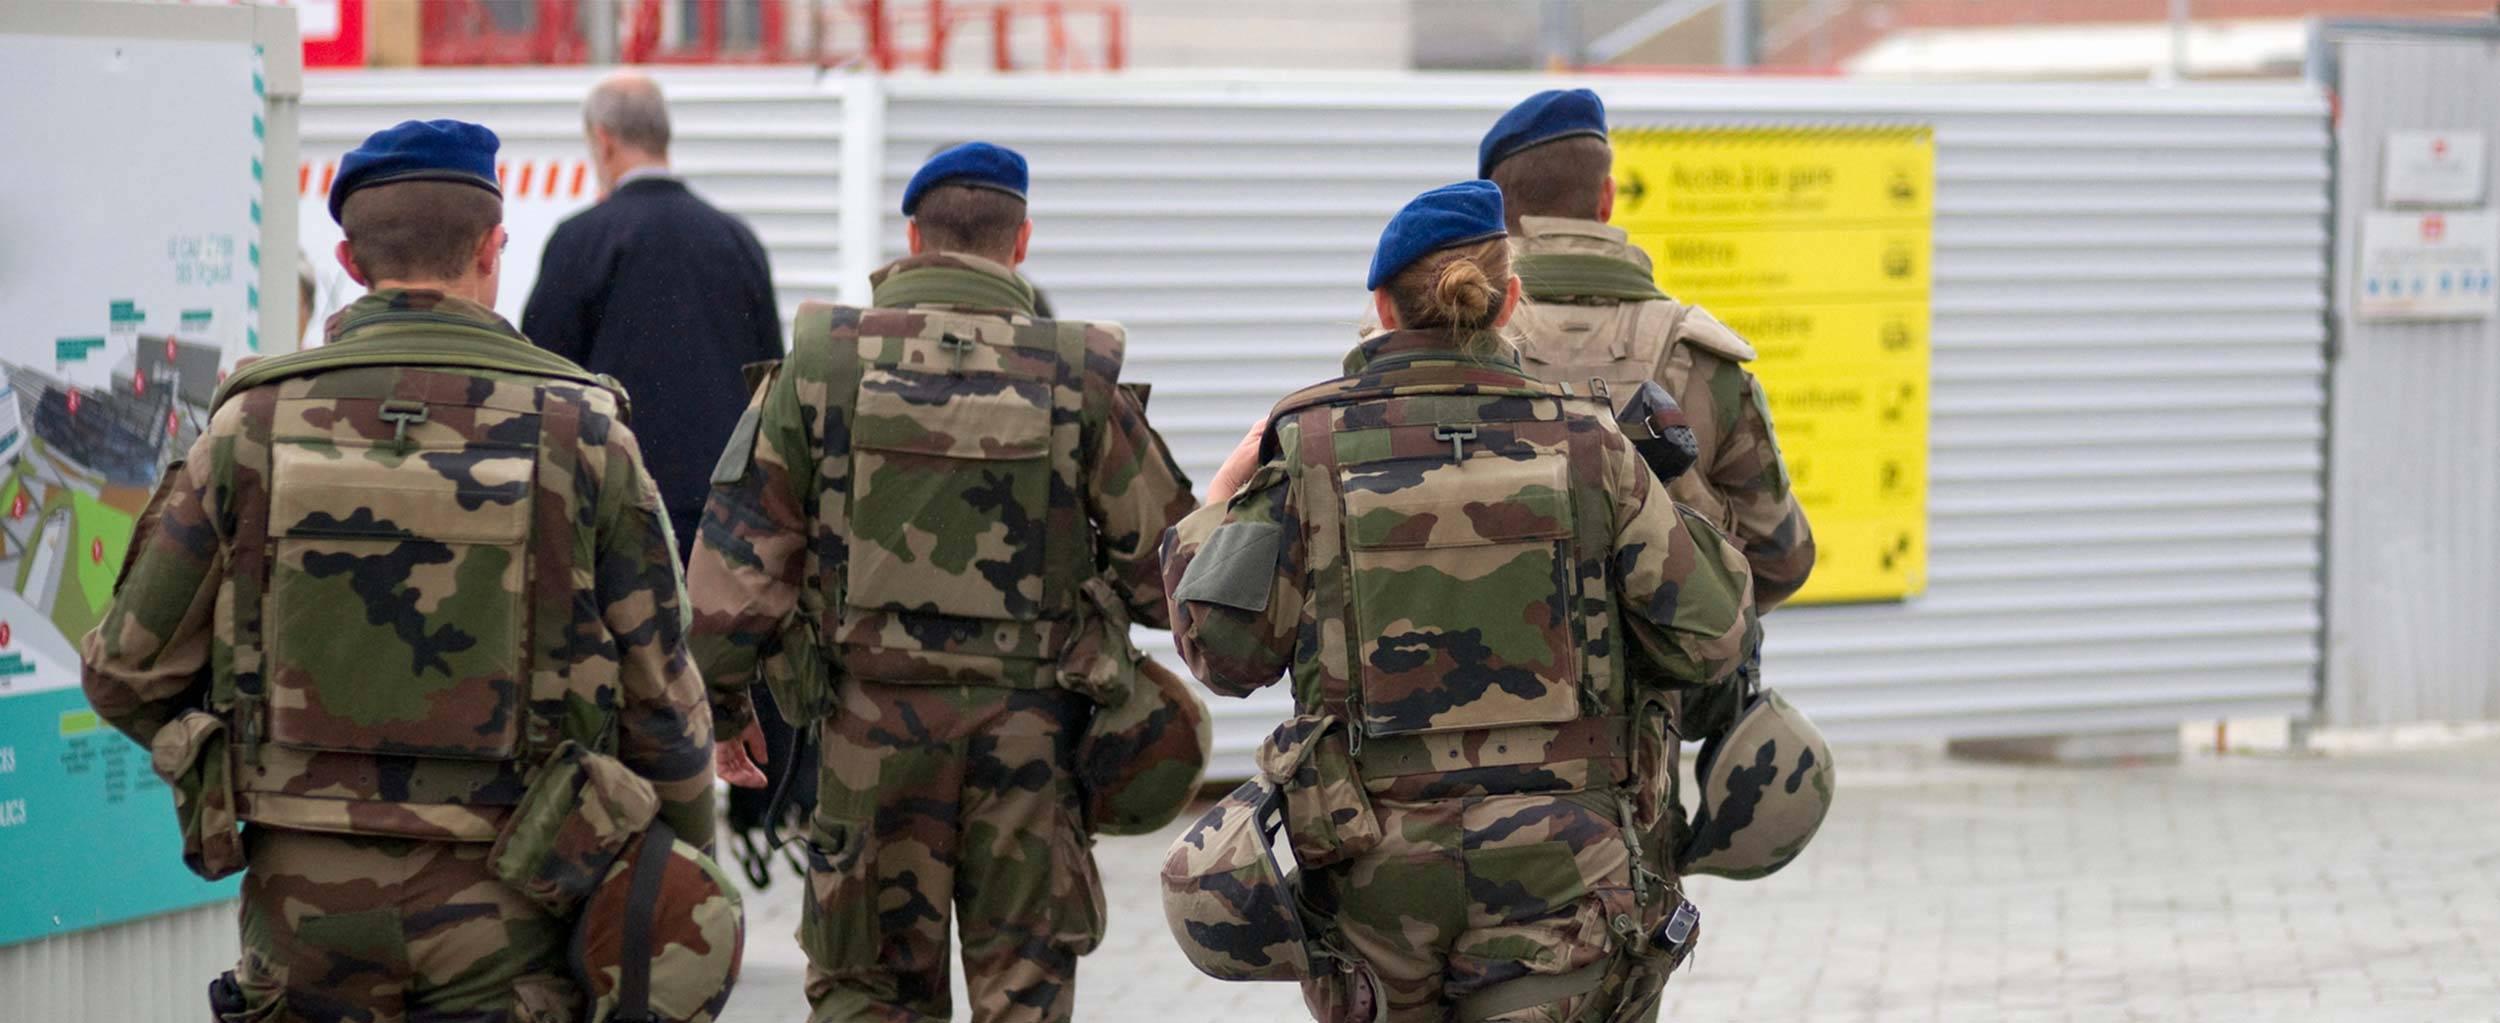 defense-plan-vigipirate-antiterrorisme-emmanuel-macron.jpg